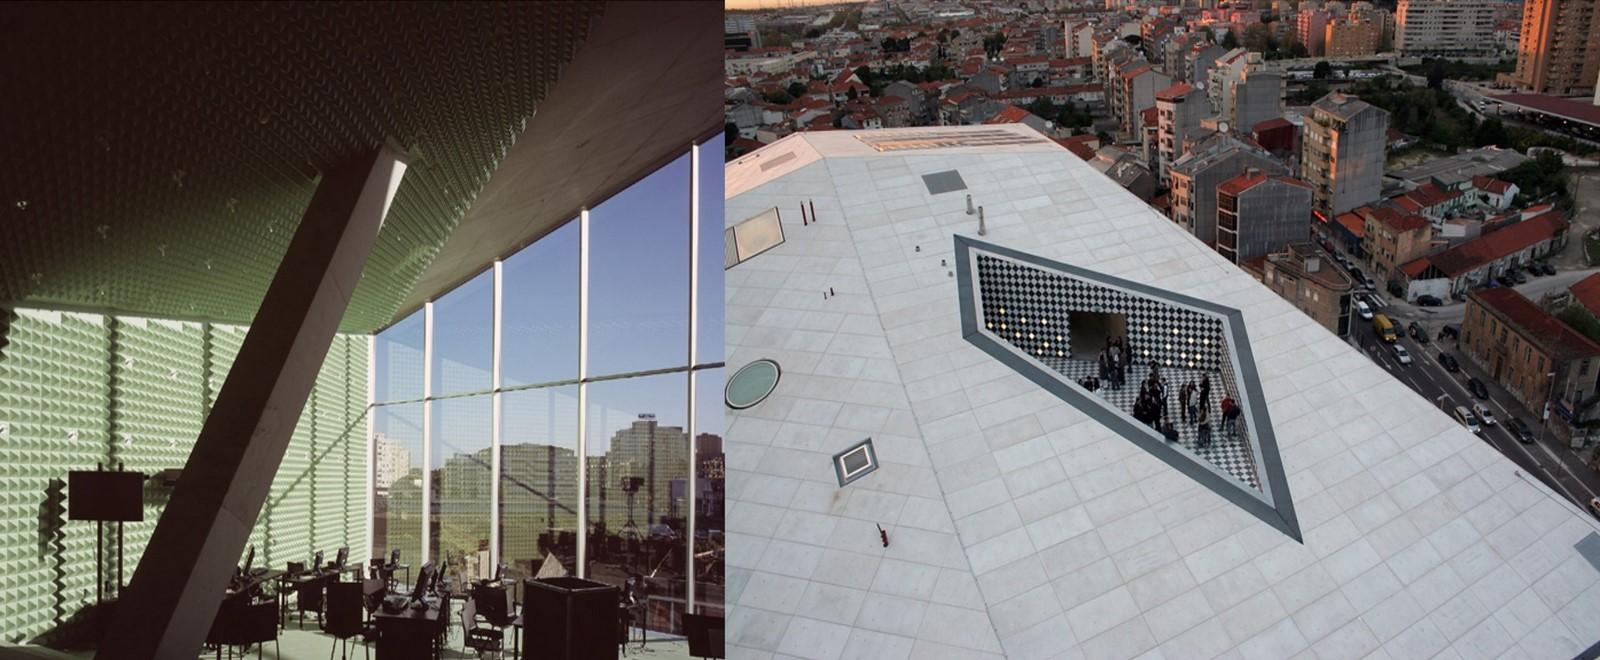 Casa Da Musica, Porto by Rem Koolhaas: The Asymmetrical Polyhedron - Sheet10